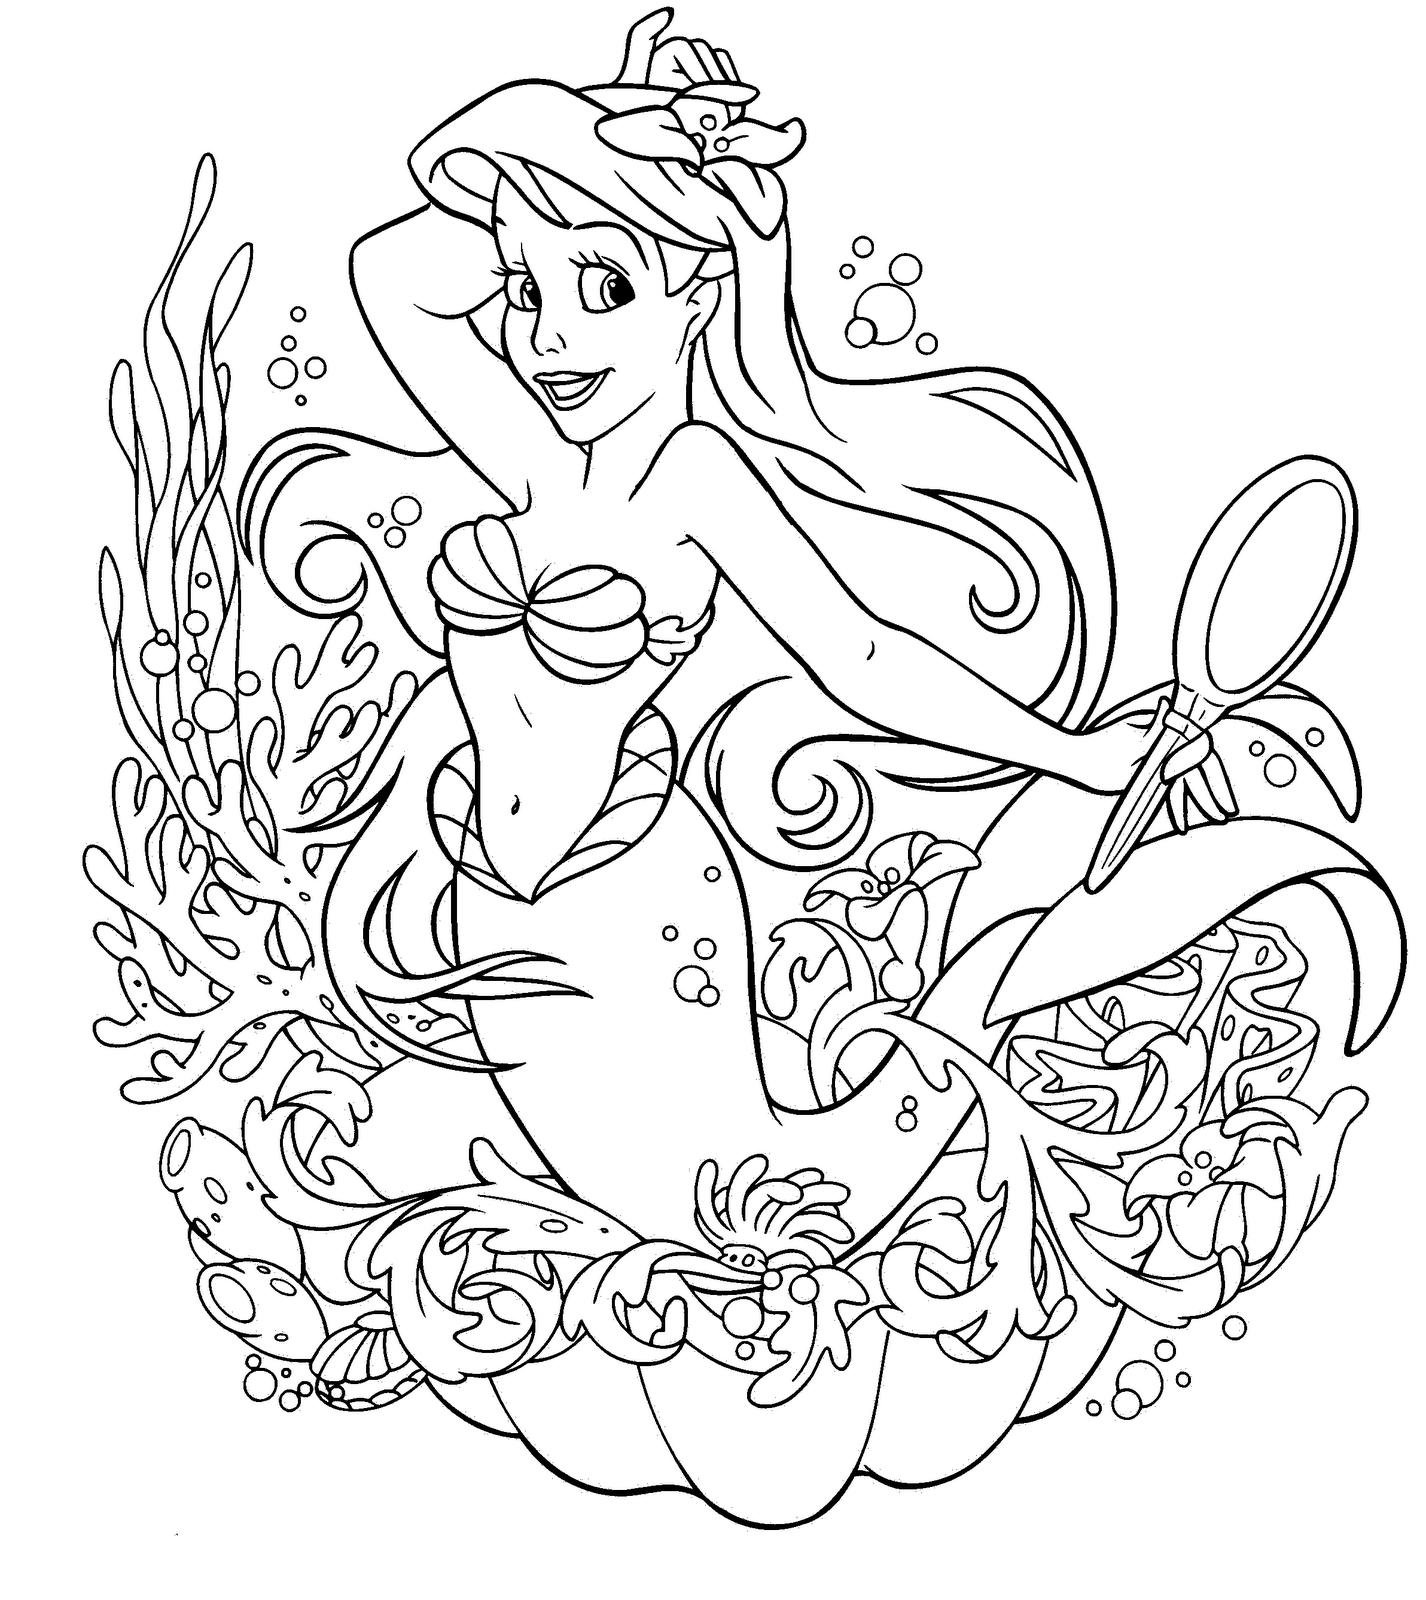 1426x1600 Disney Coloring Pages Disney Princess, Free